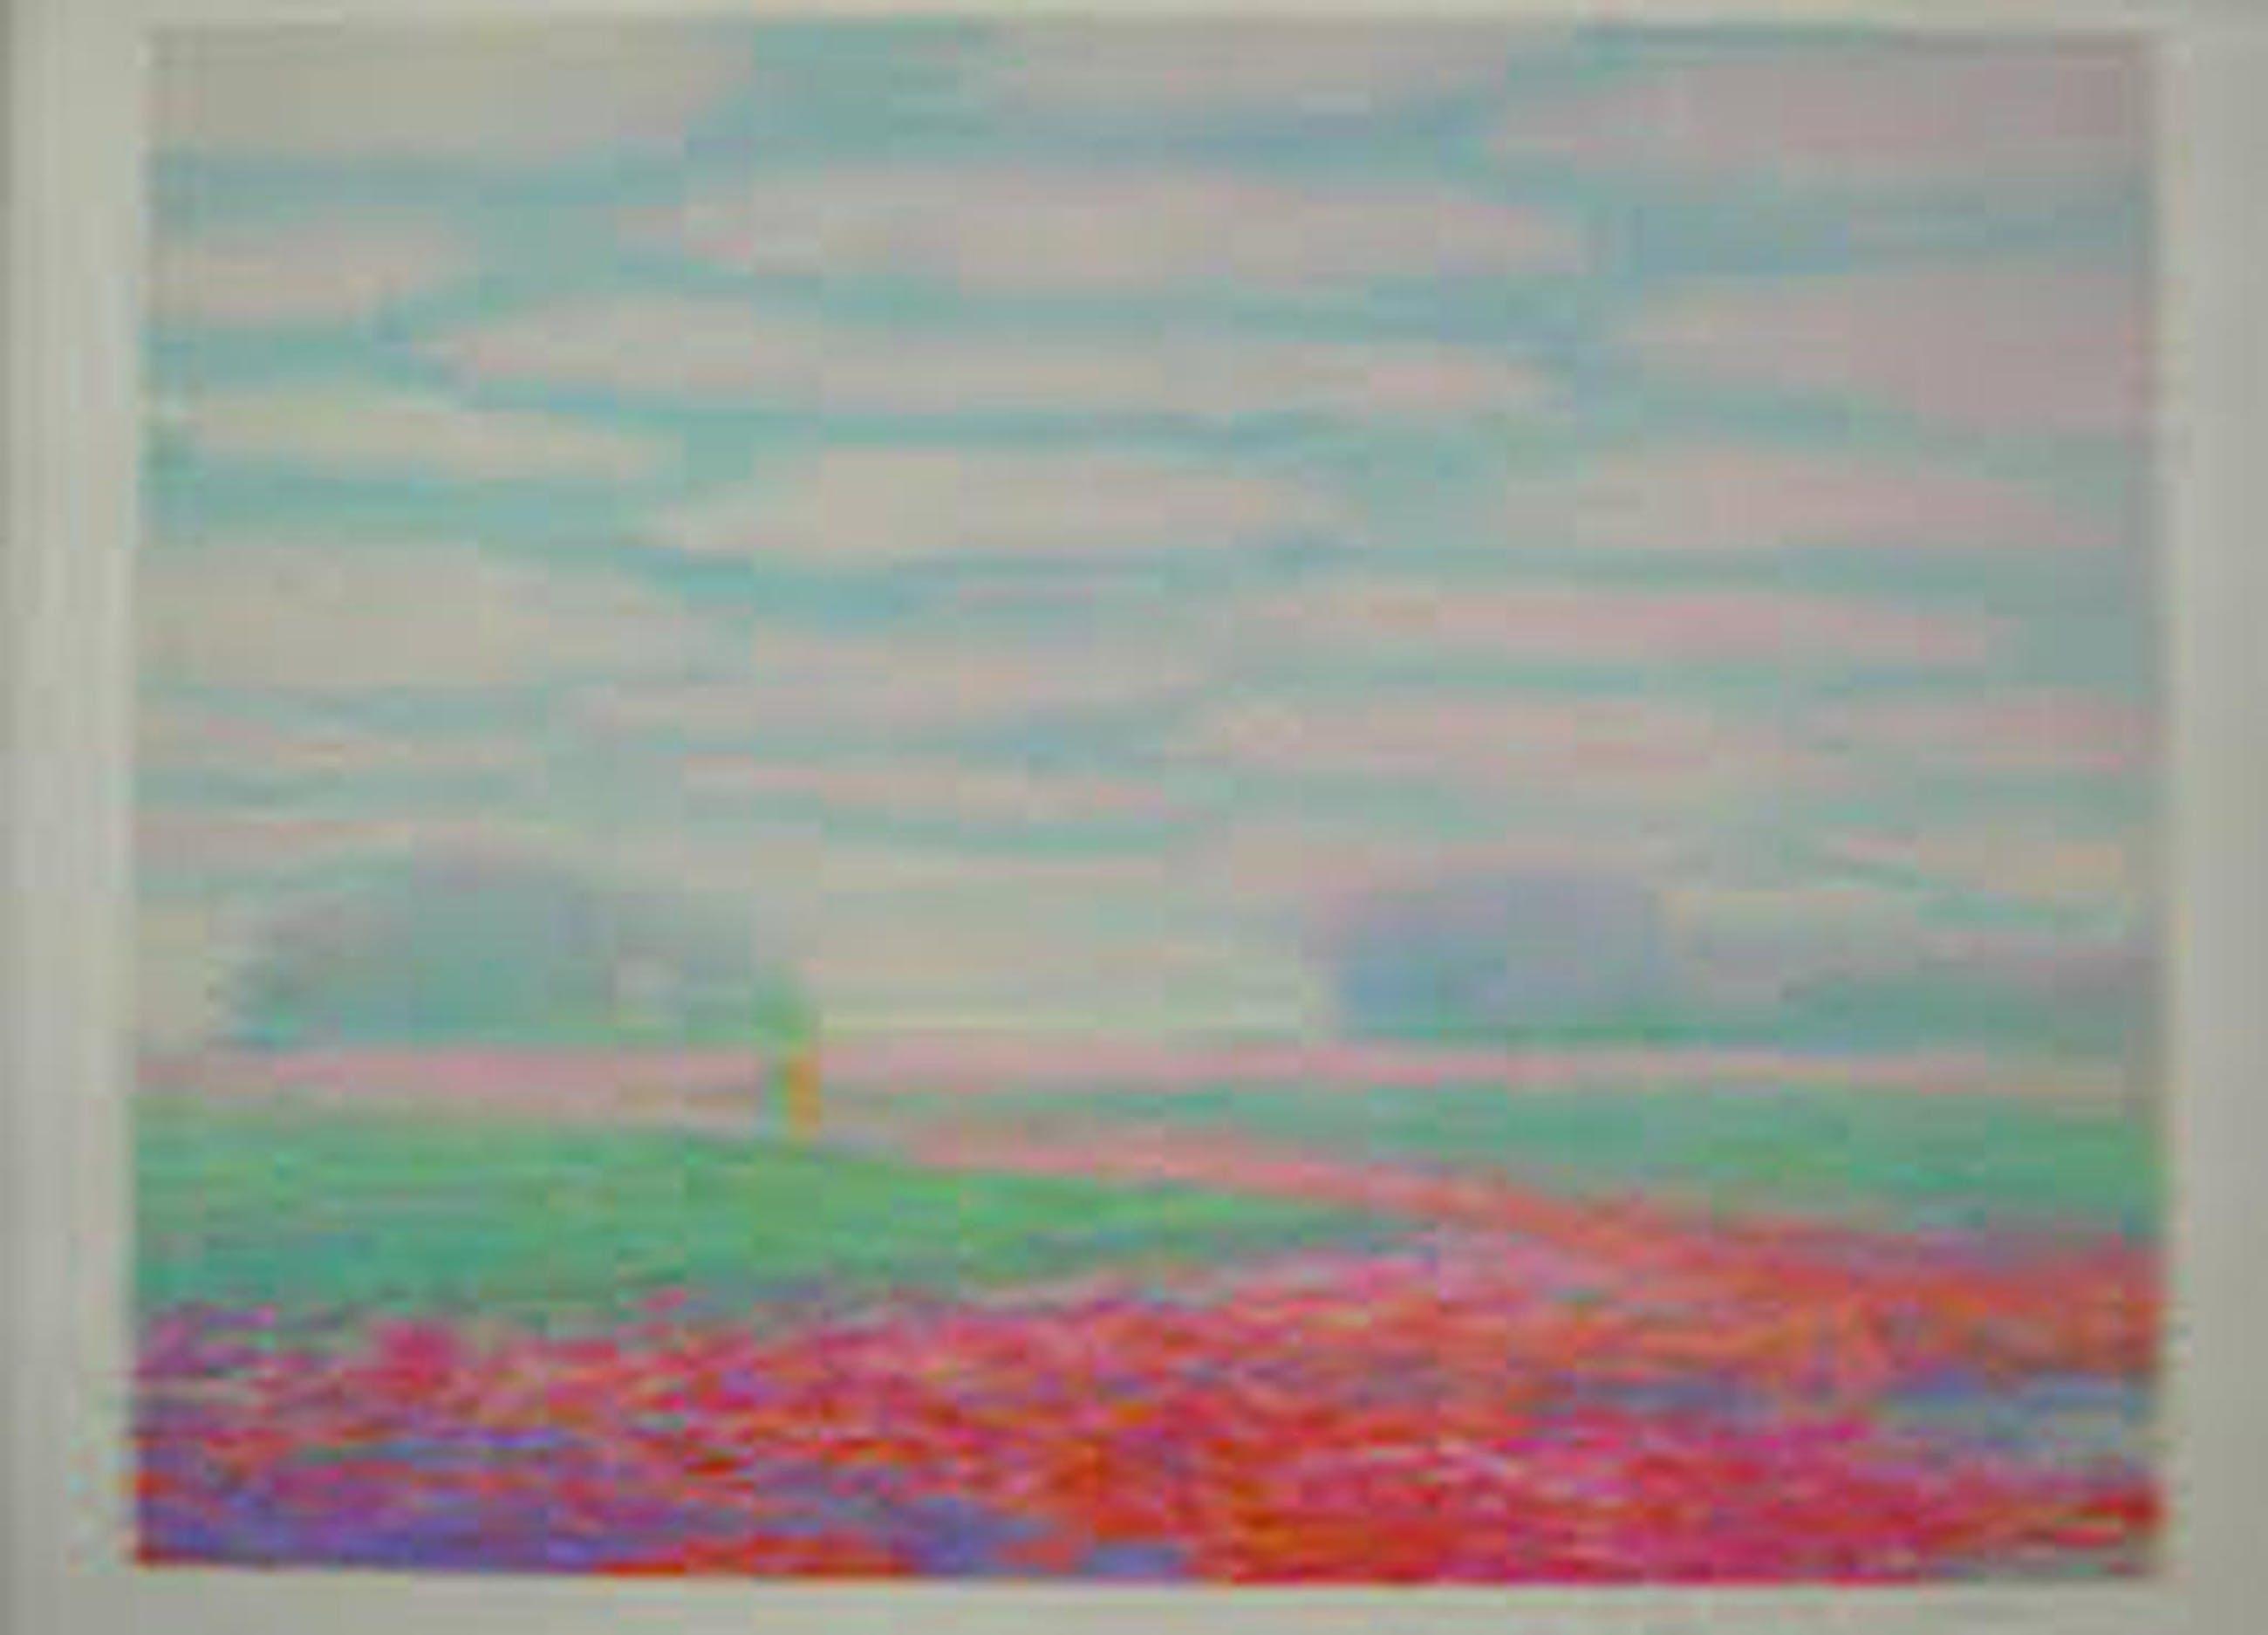 Jean Fernand - Orly le Trois Hetres - Litho - Handgesigneerd - Opl. 170+180 kopen? Bied vanaf 1!